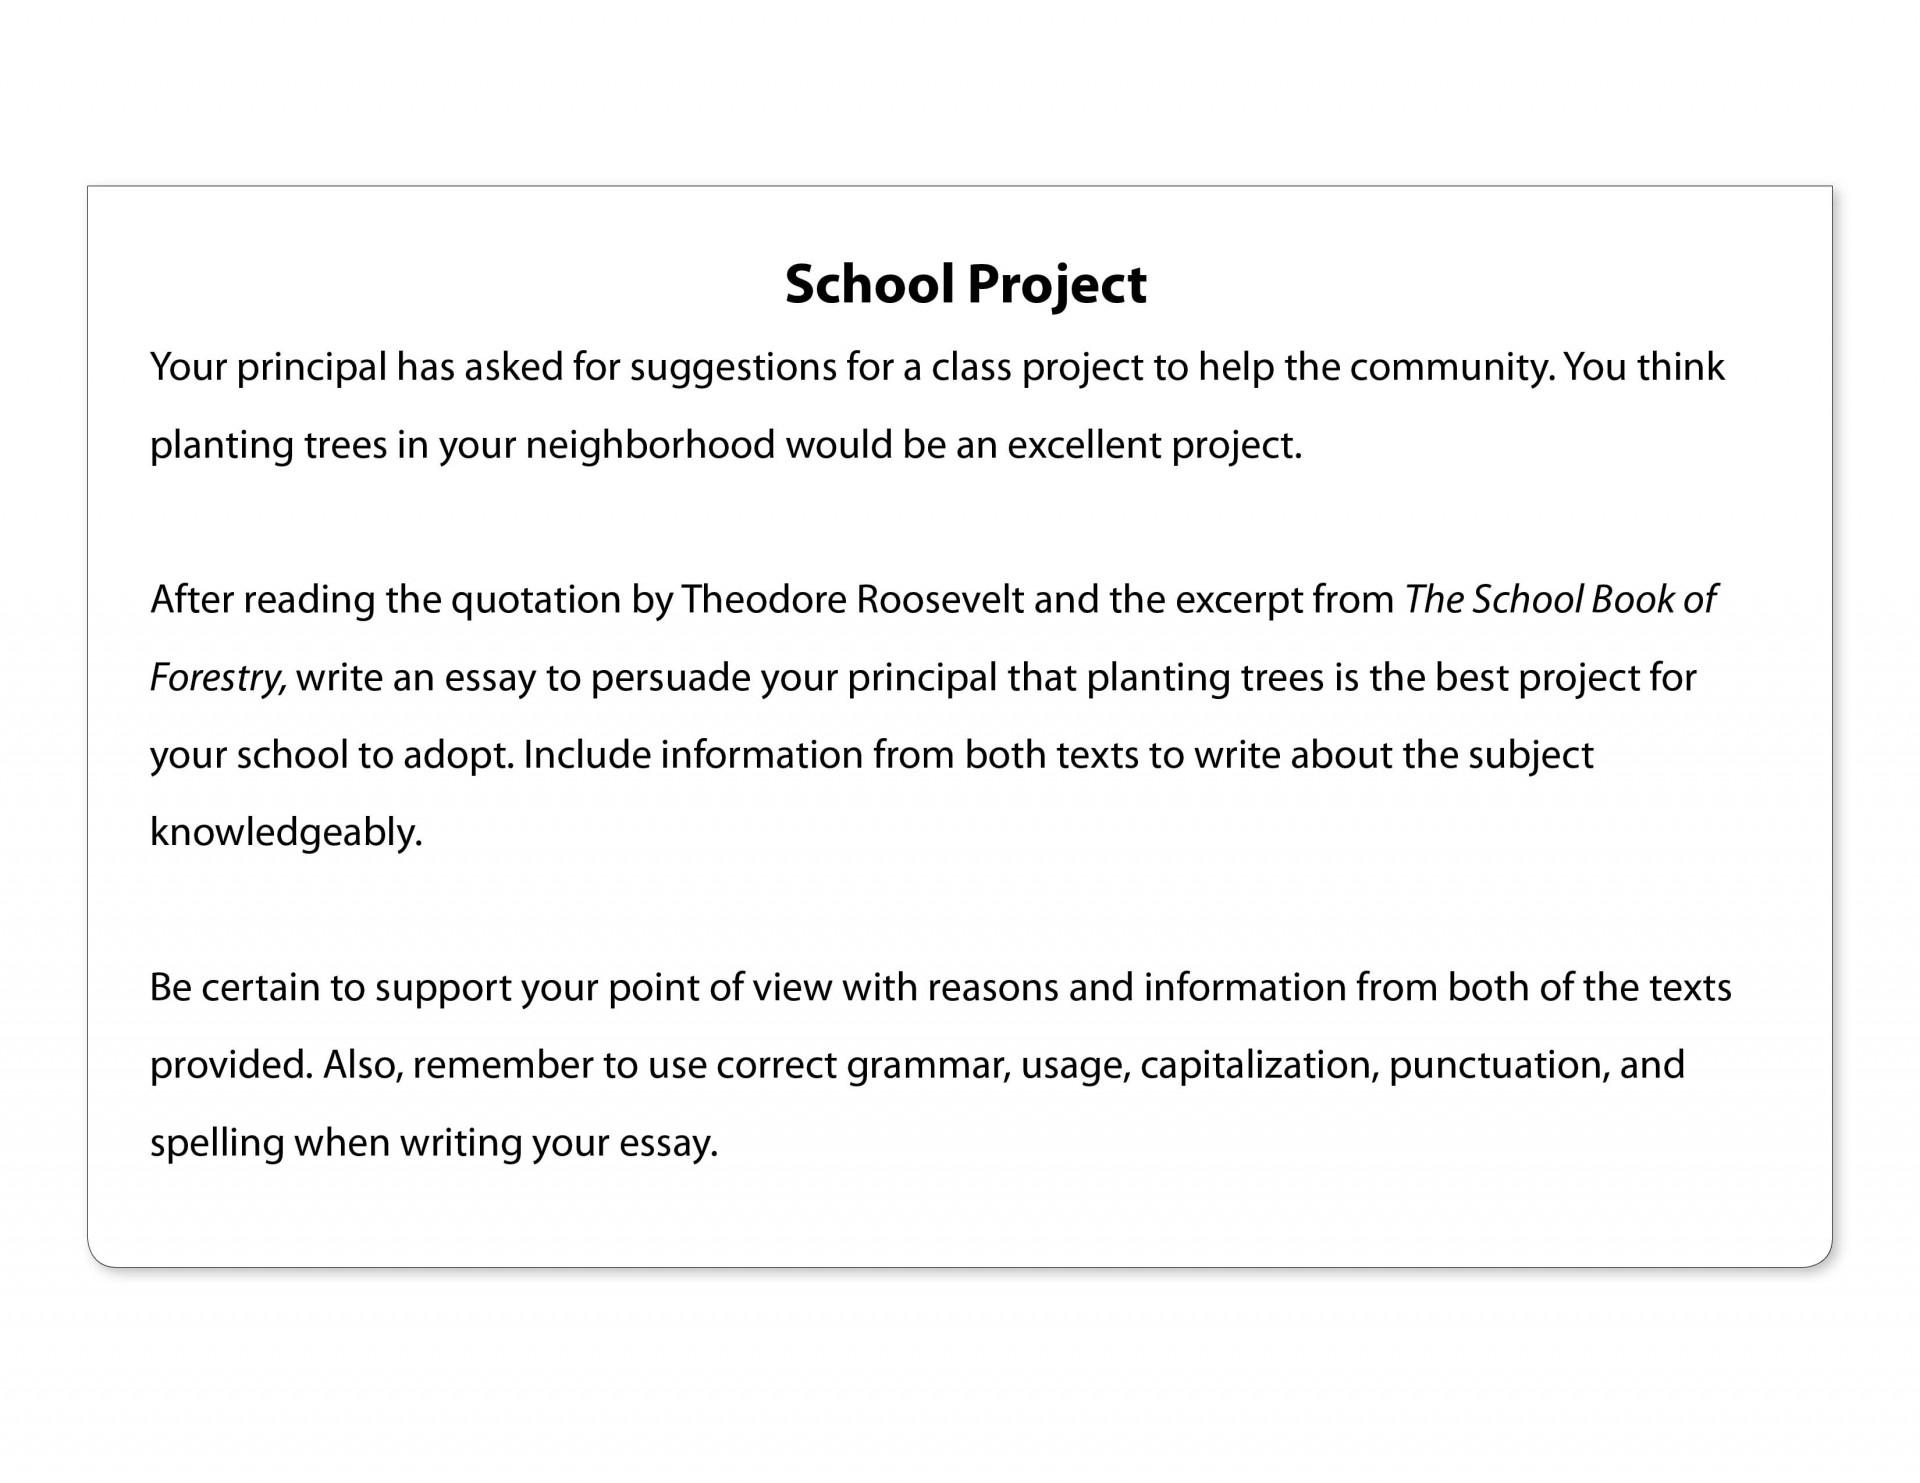 018 Essay Example Reword Faq  School Project Original Jpeg Amazing Generator Free1920